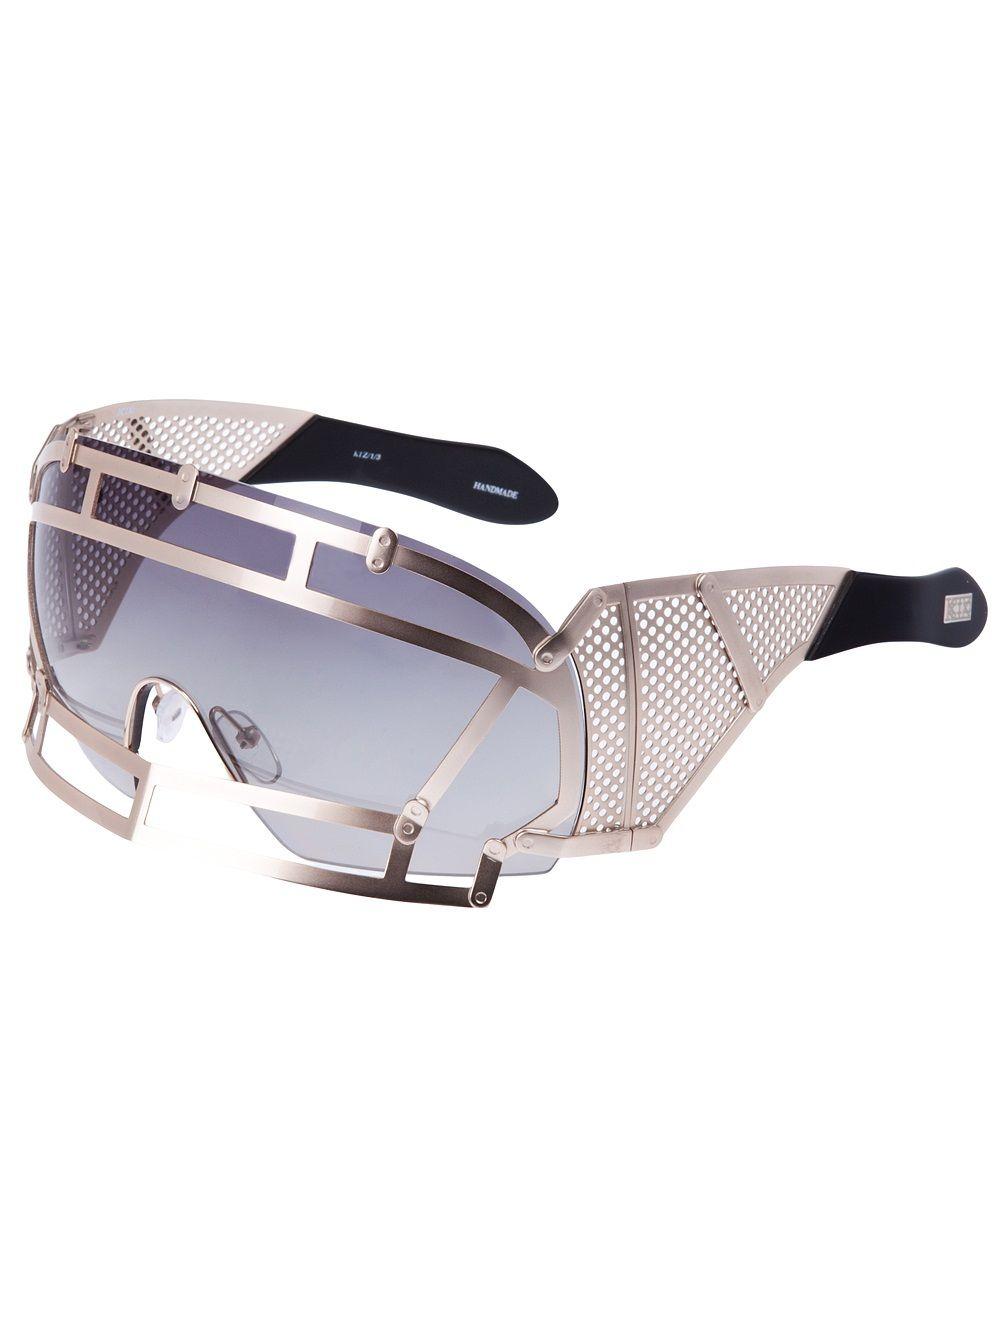 Linda Farrow - Futuristic Sunglasses | Futuristic Metallics | Pinterest